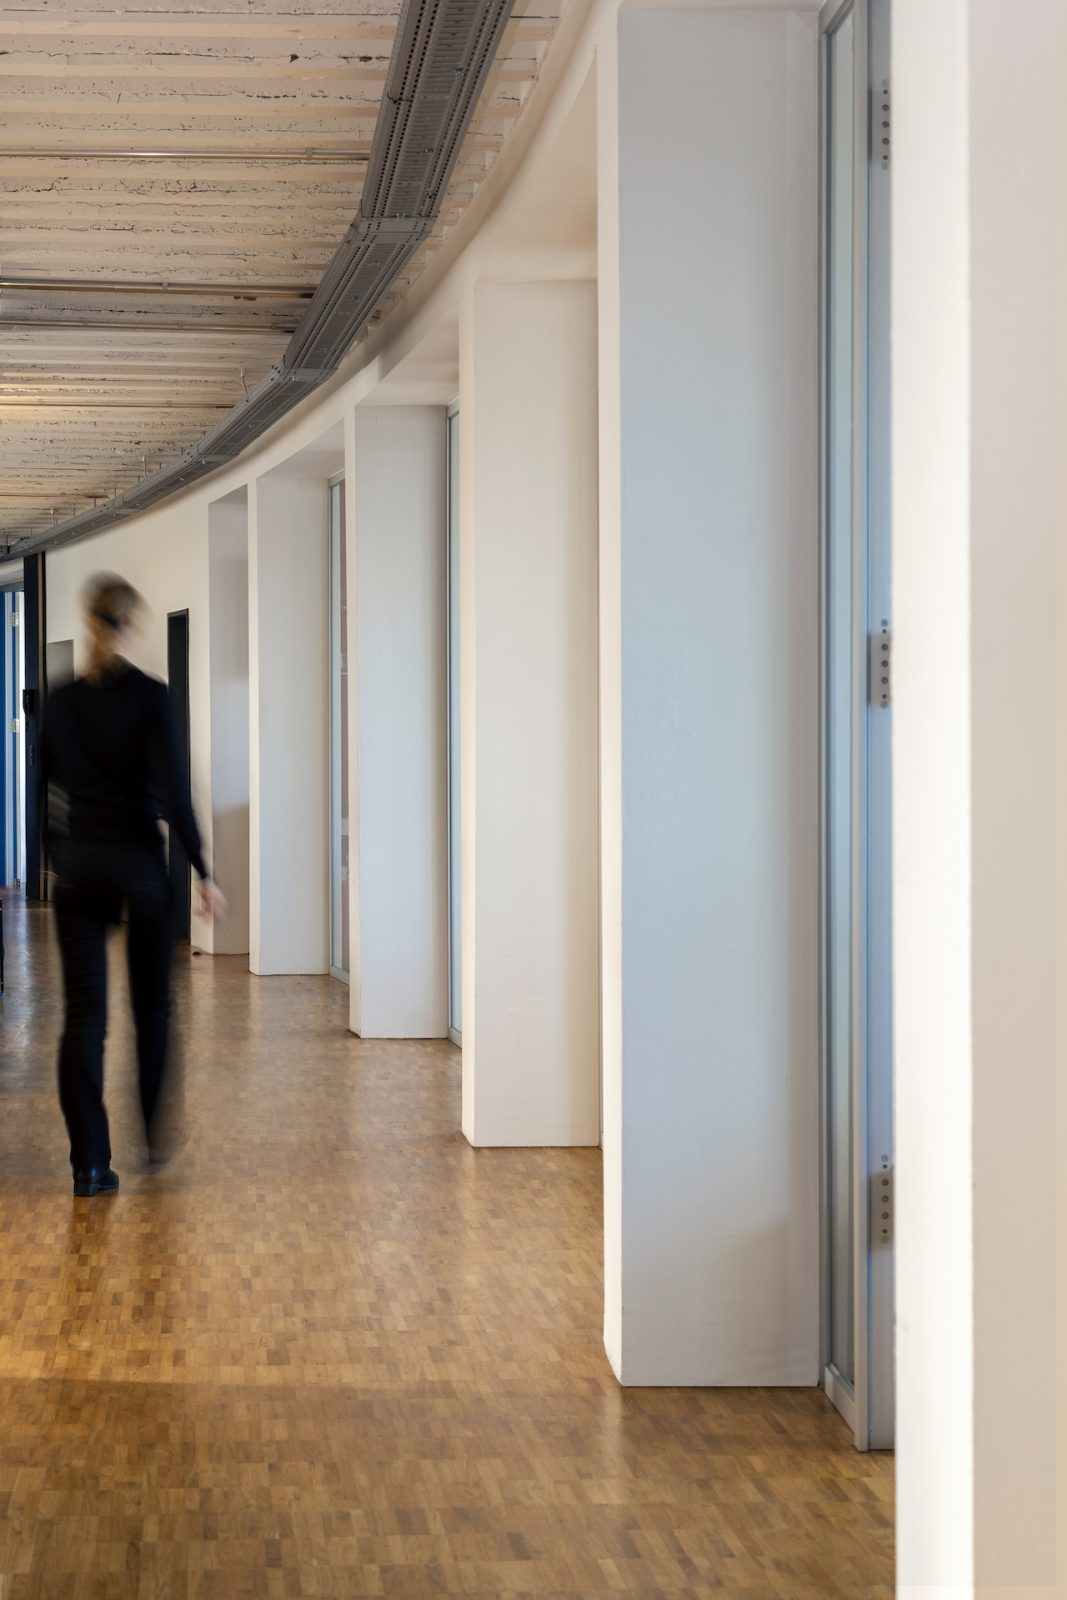 architekturbüro ruser & partner, karlsruhe